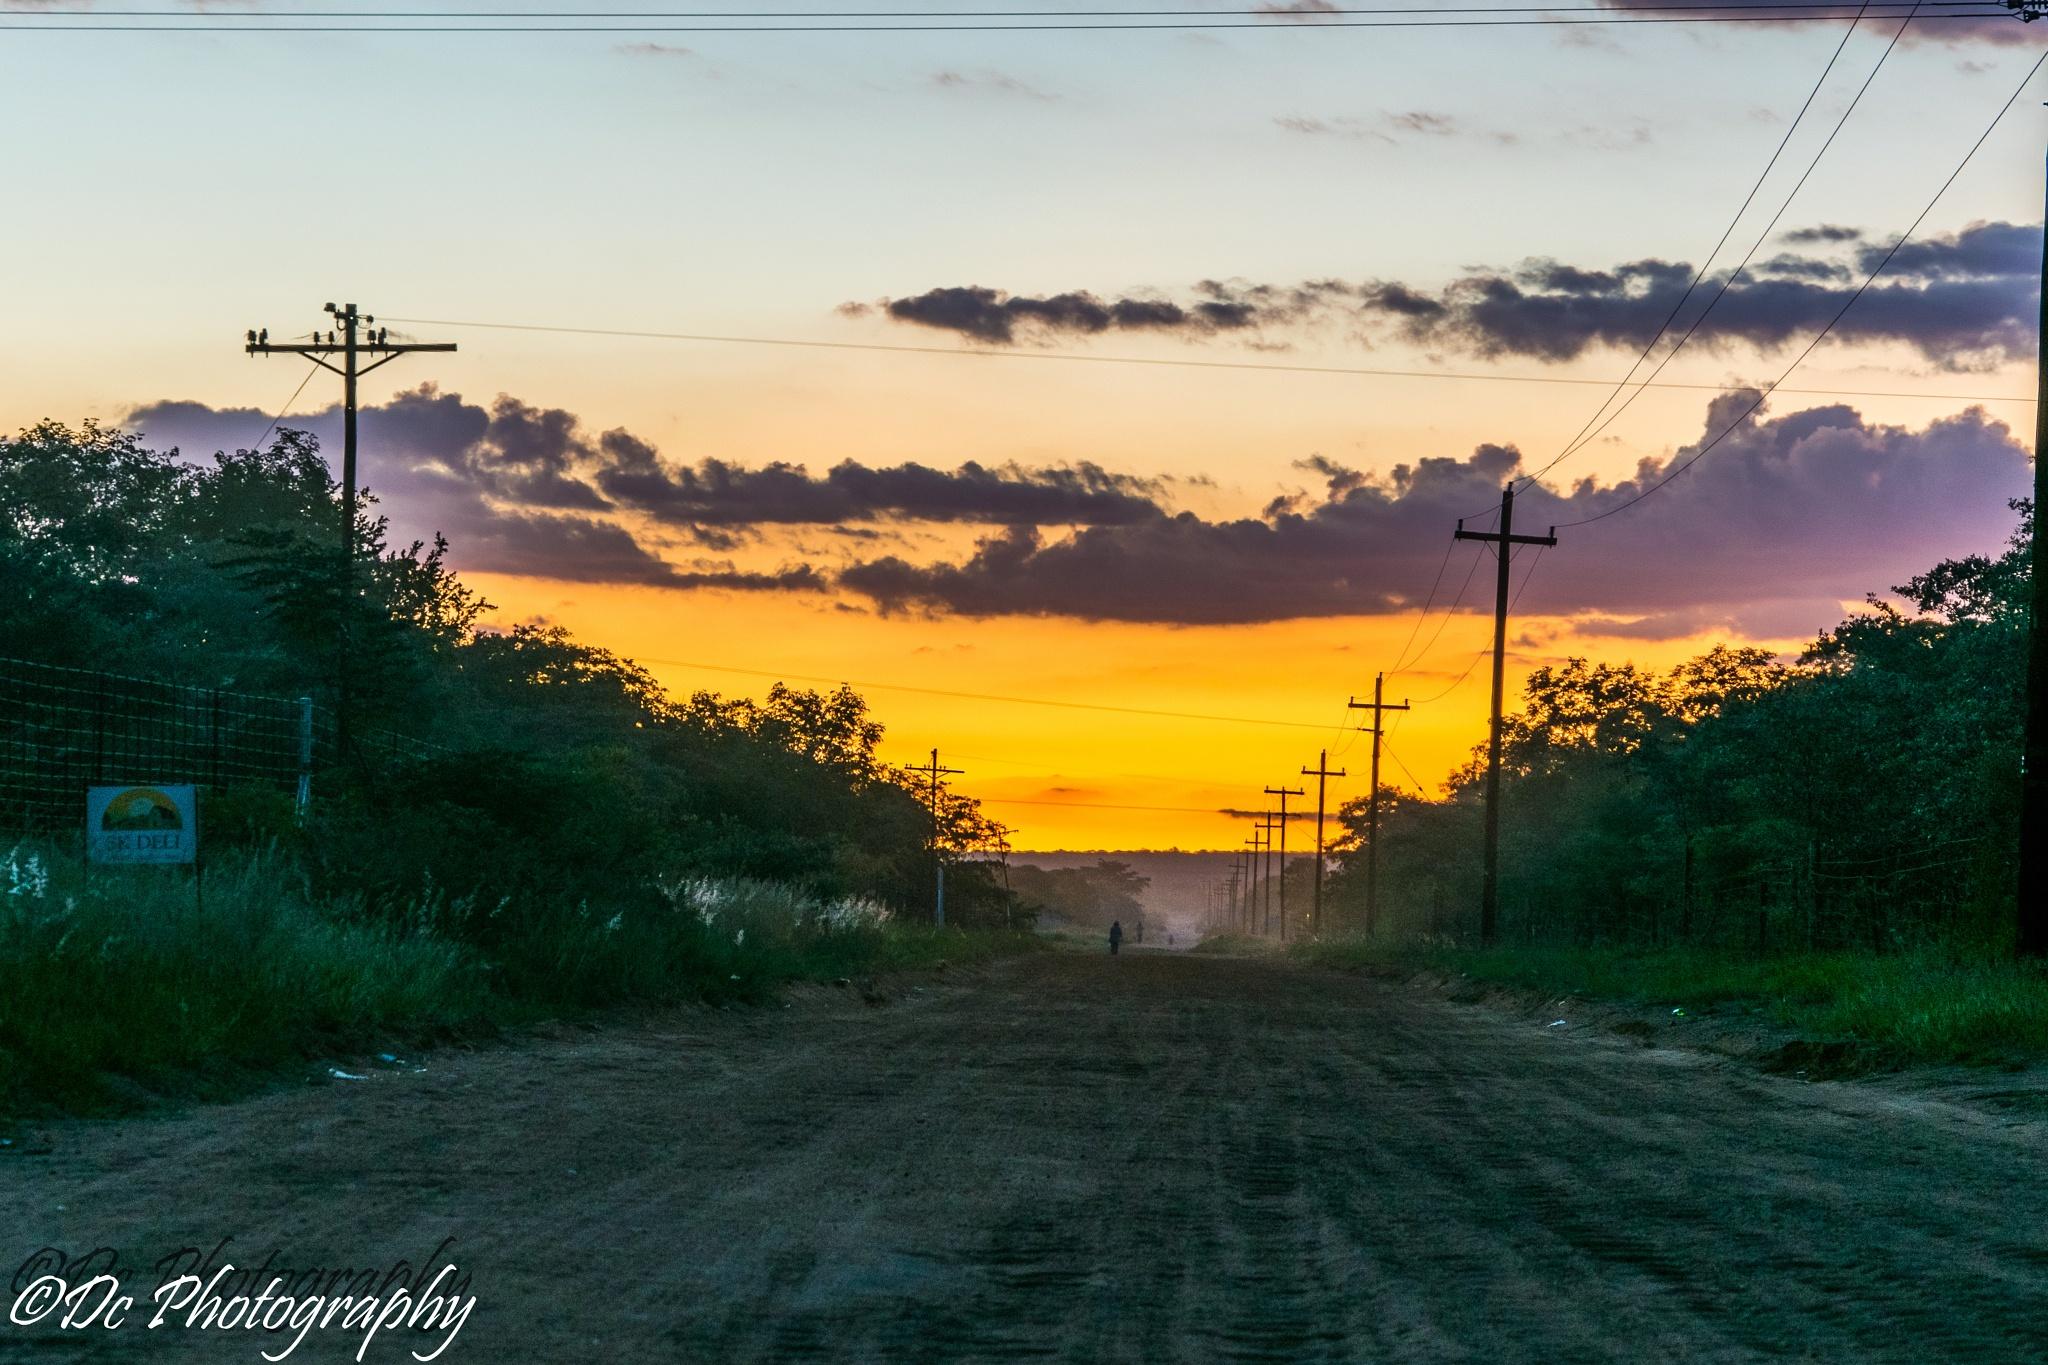 Sunset by Dusky De Reuck